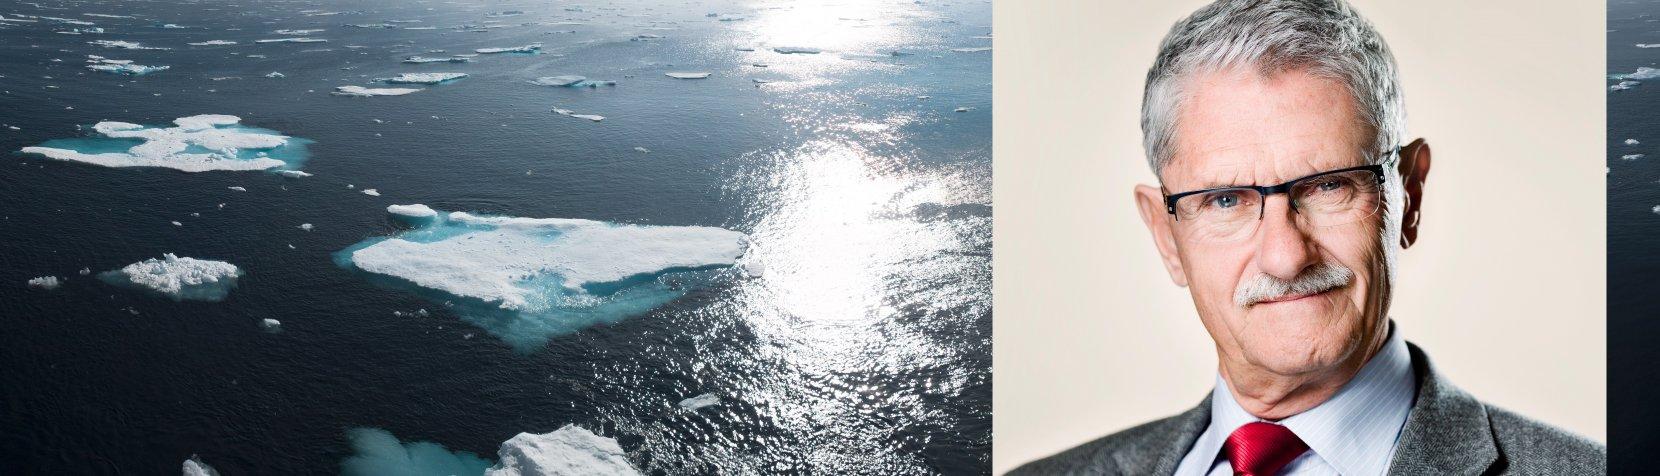 Mogens Lykketoft - fotograf Steen Brogaard - klima